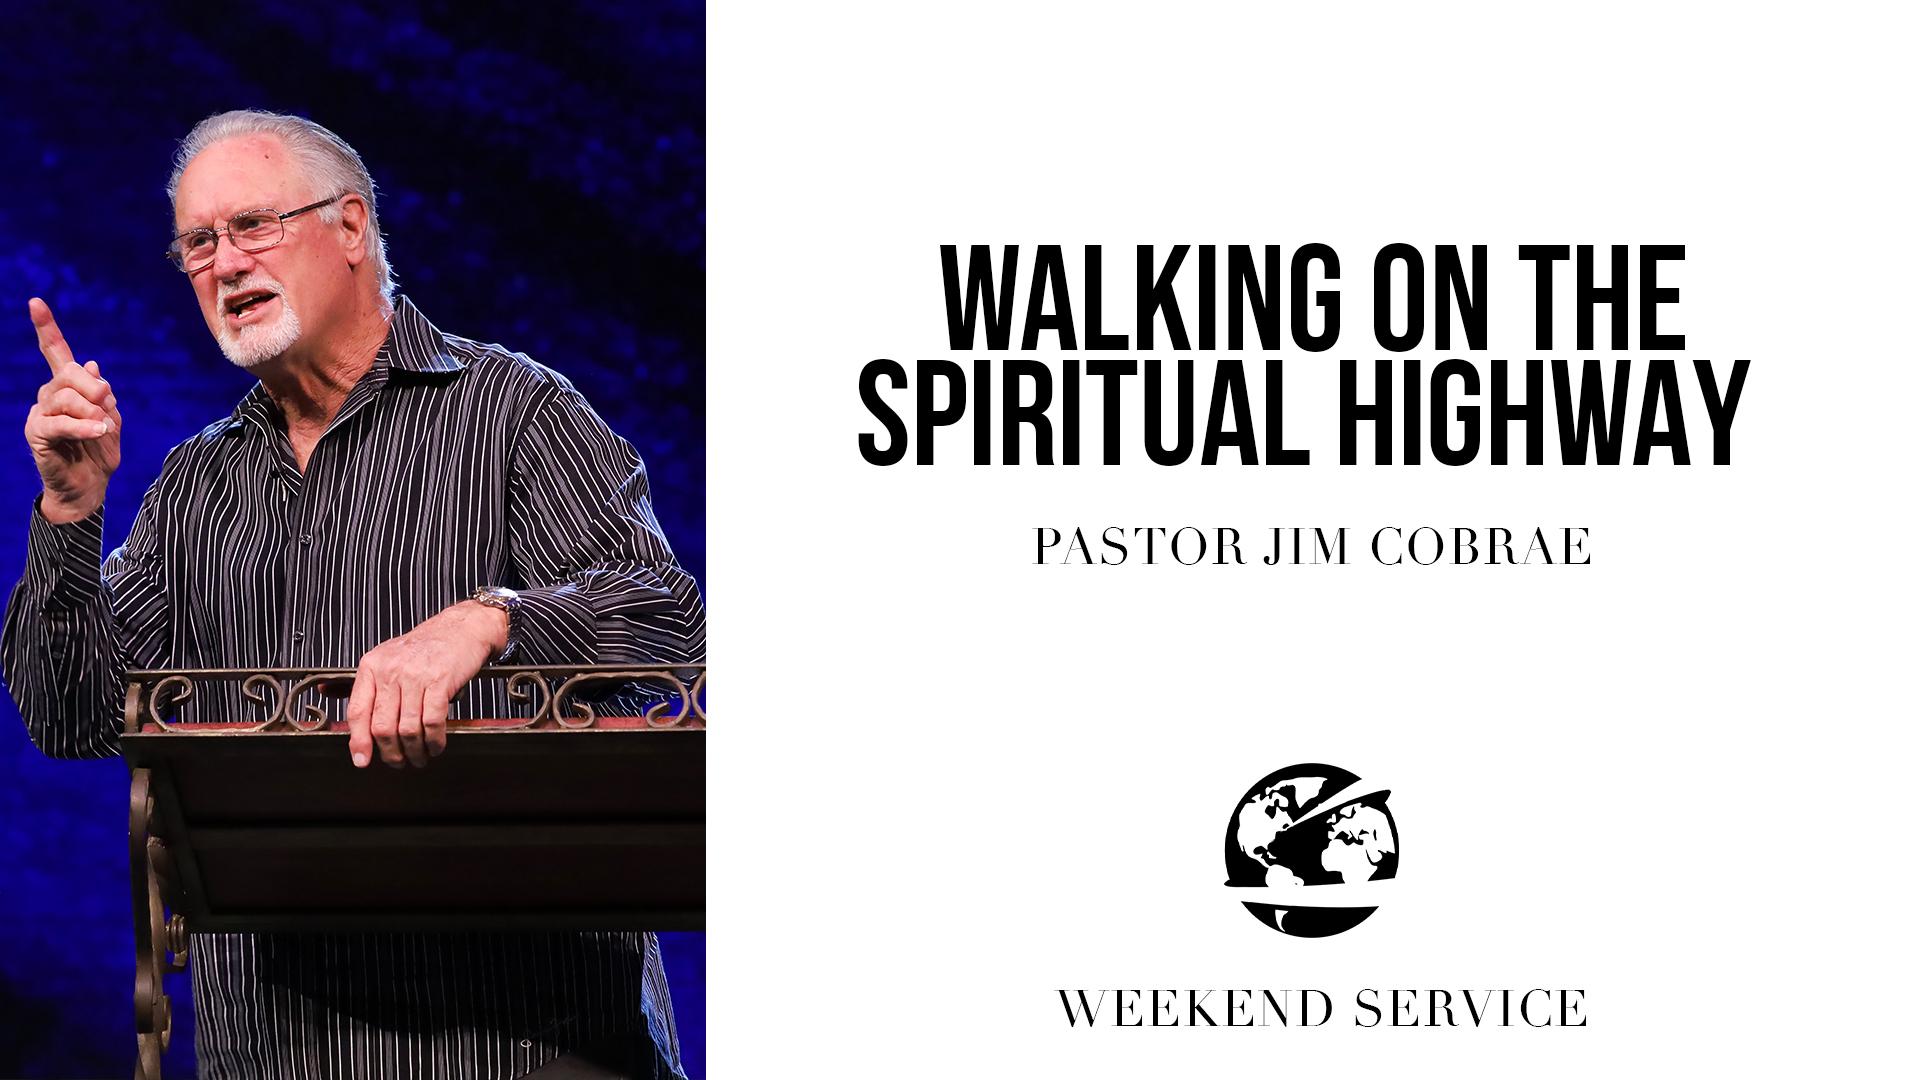 Watch Walking on the Spiritual Highway